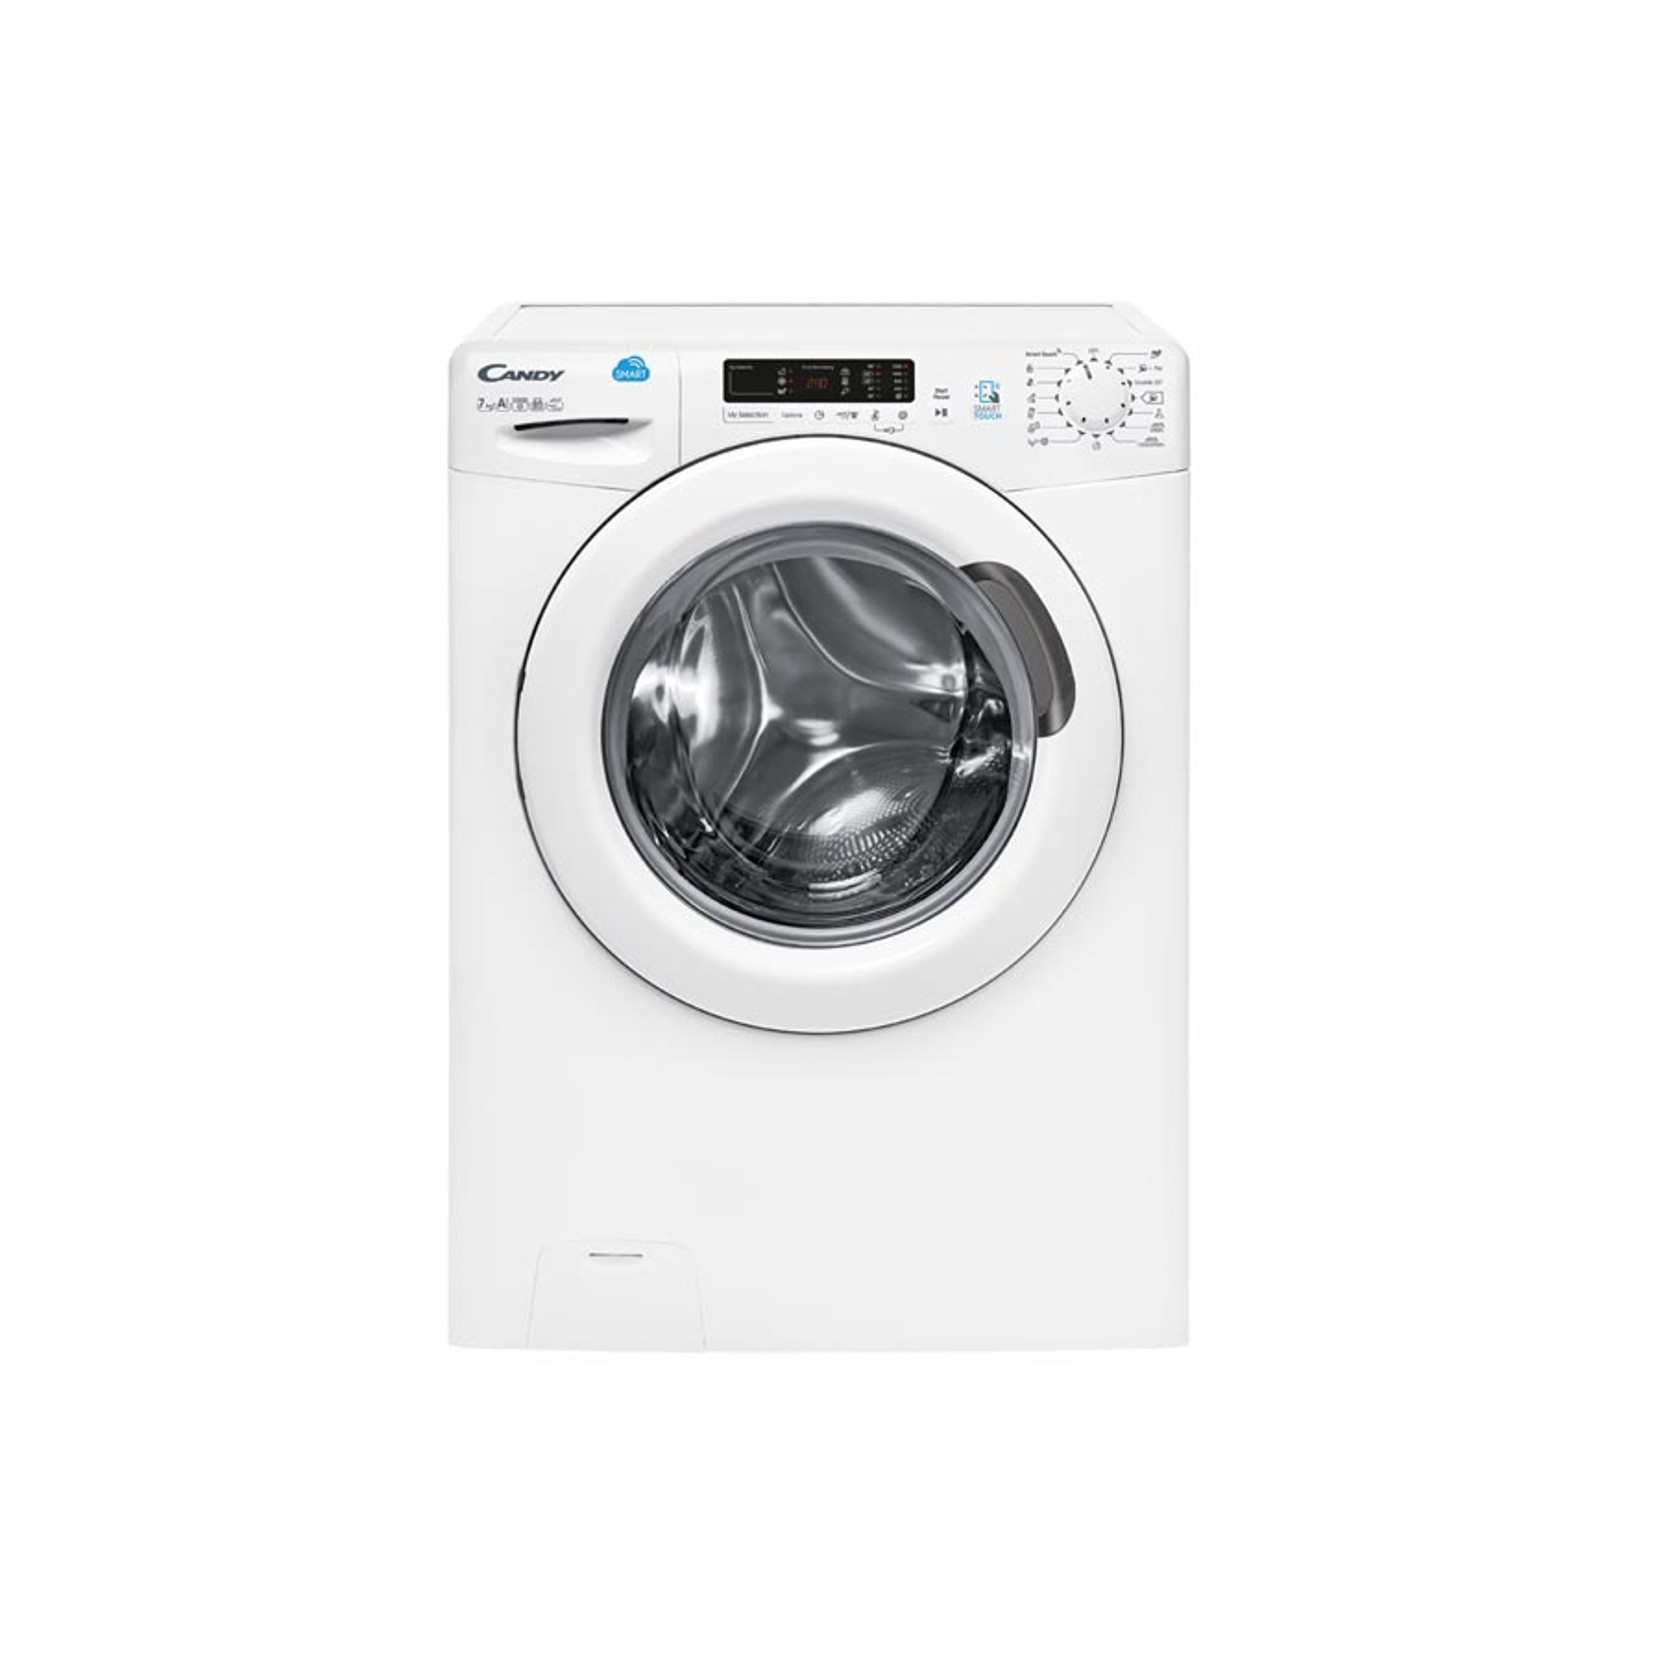 lavatrice candy cs41272d3 slim 40 cm 7 kg a 1200 giri